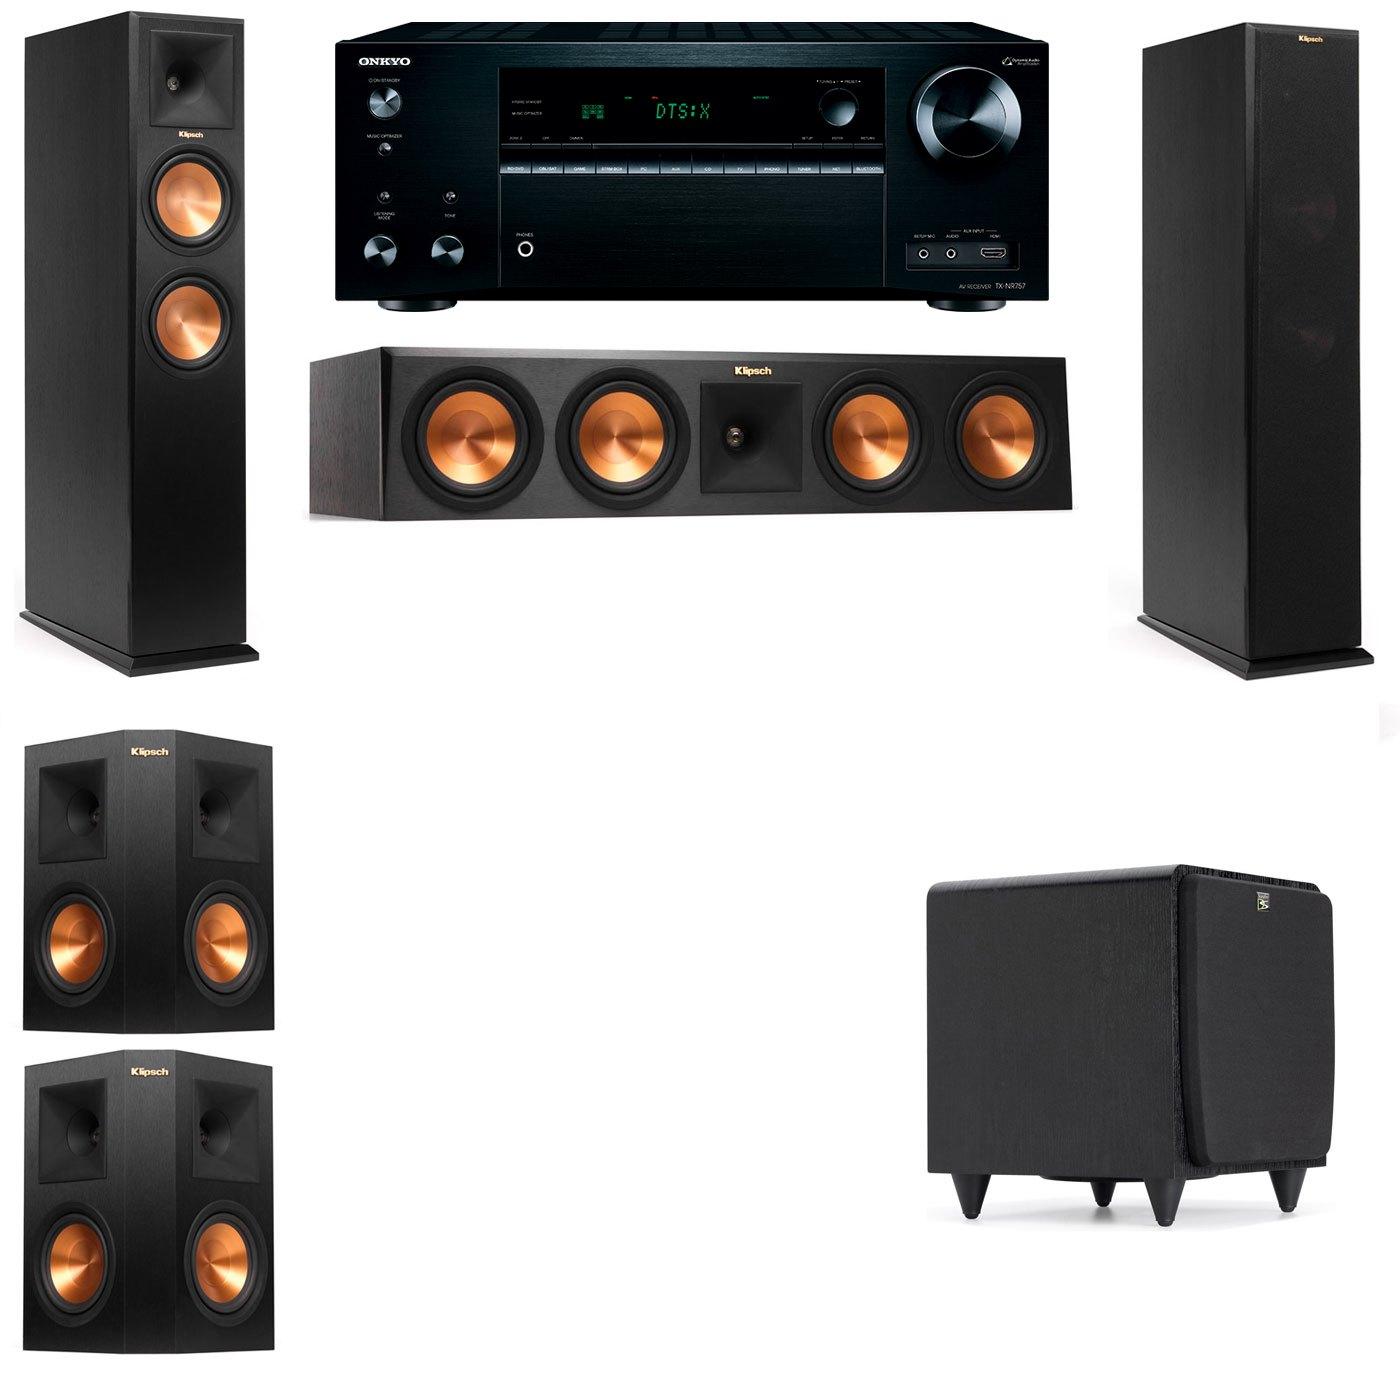 Klipsch RP-250F Tower Speakers-SDS12-5.1-Onkyo TX-NR757